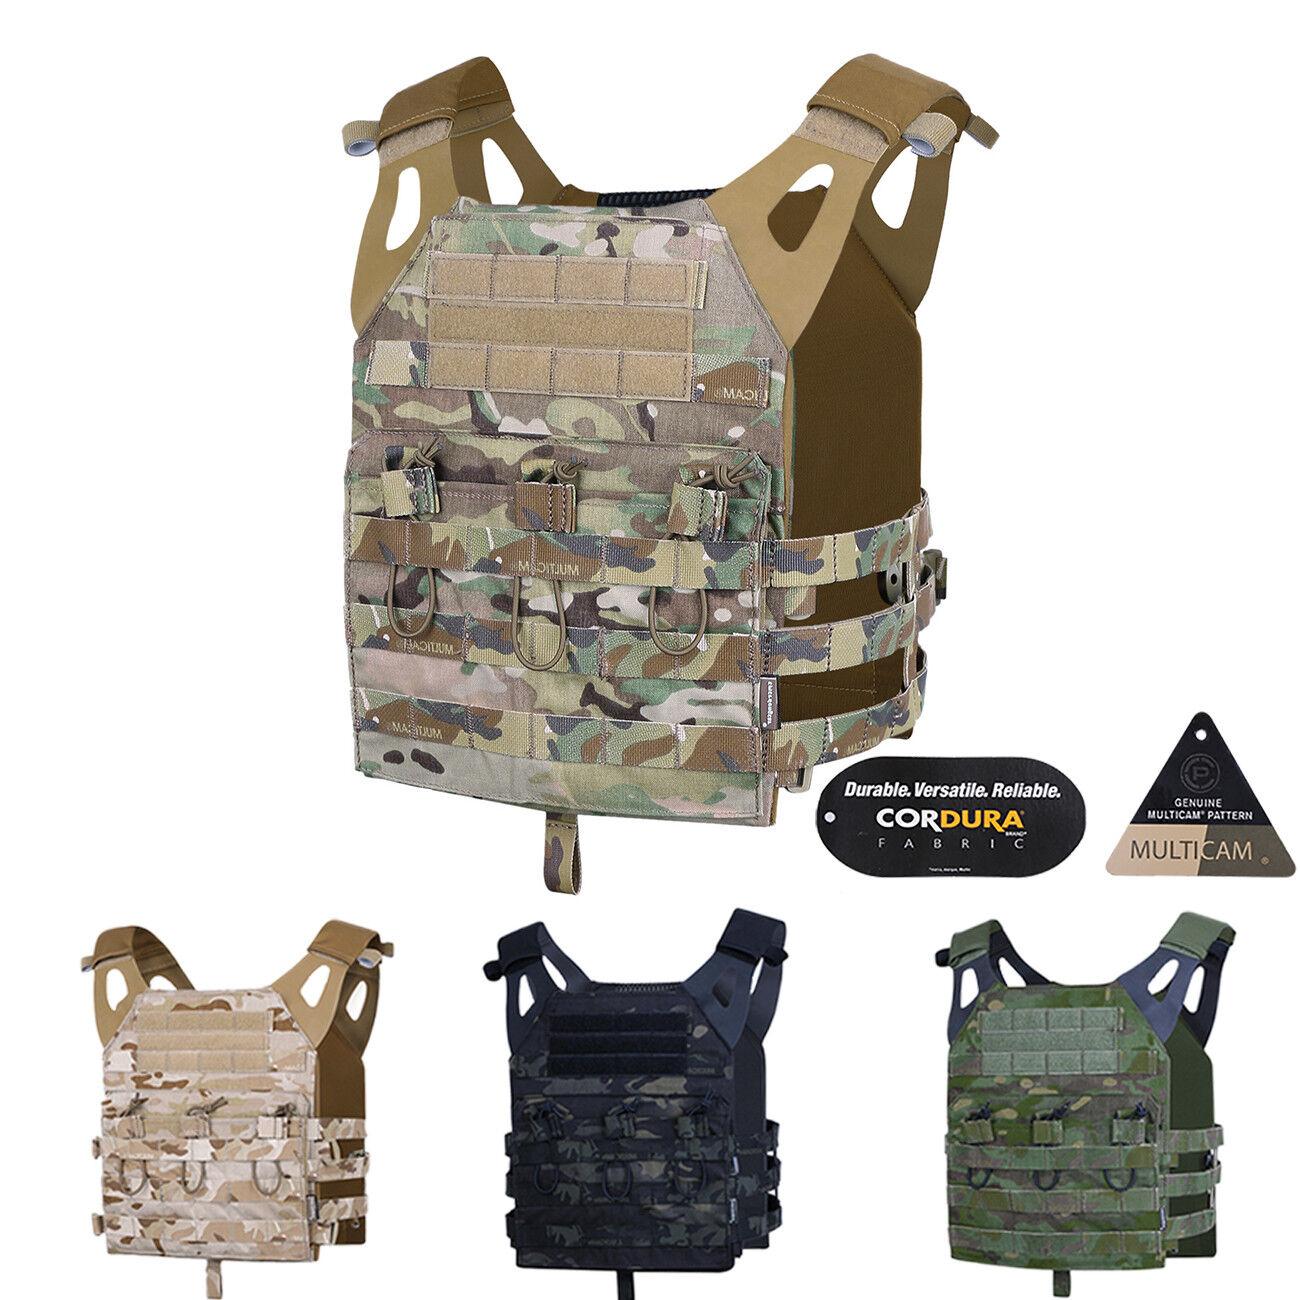 Emerson Multicam 500D JPC Body  Armor Camouflage Camo Jumpable Plate Carrier Vest  quality guaranteed